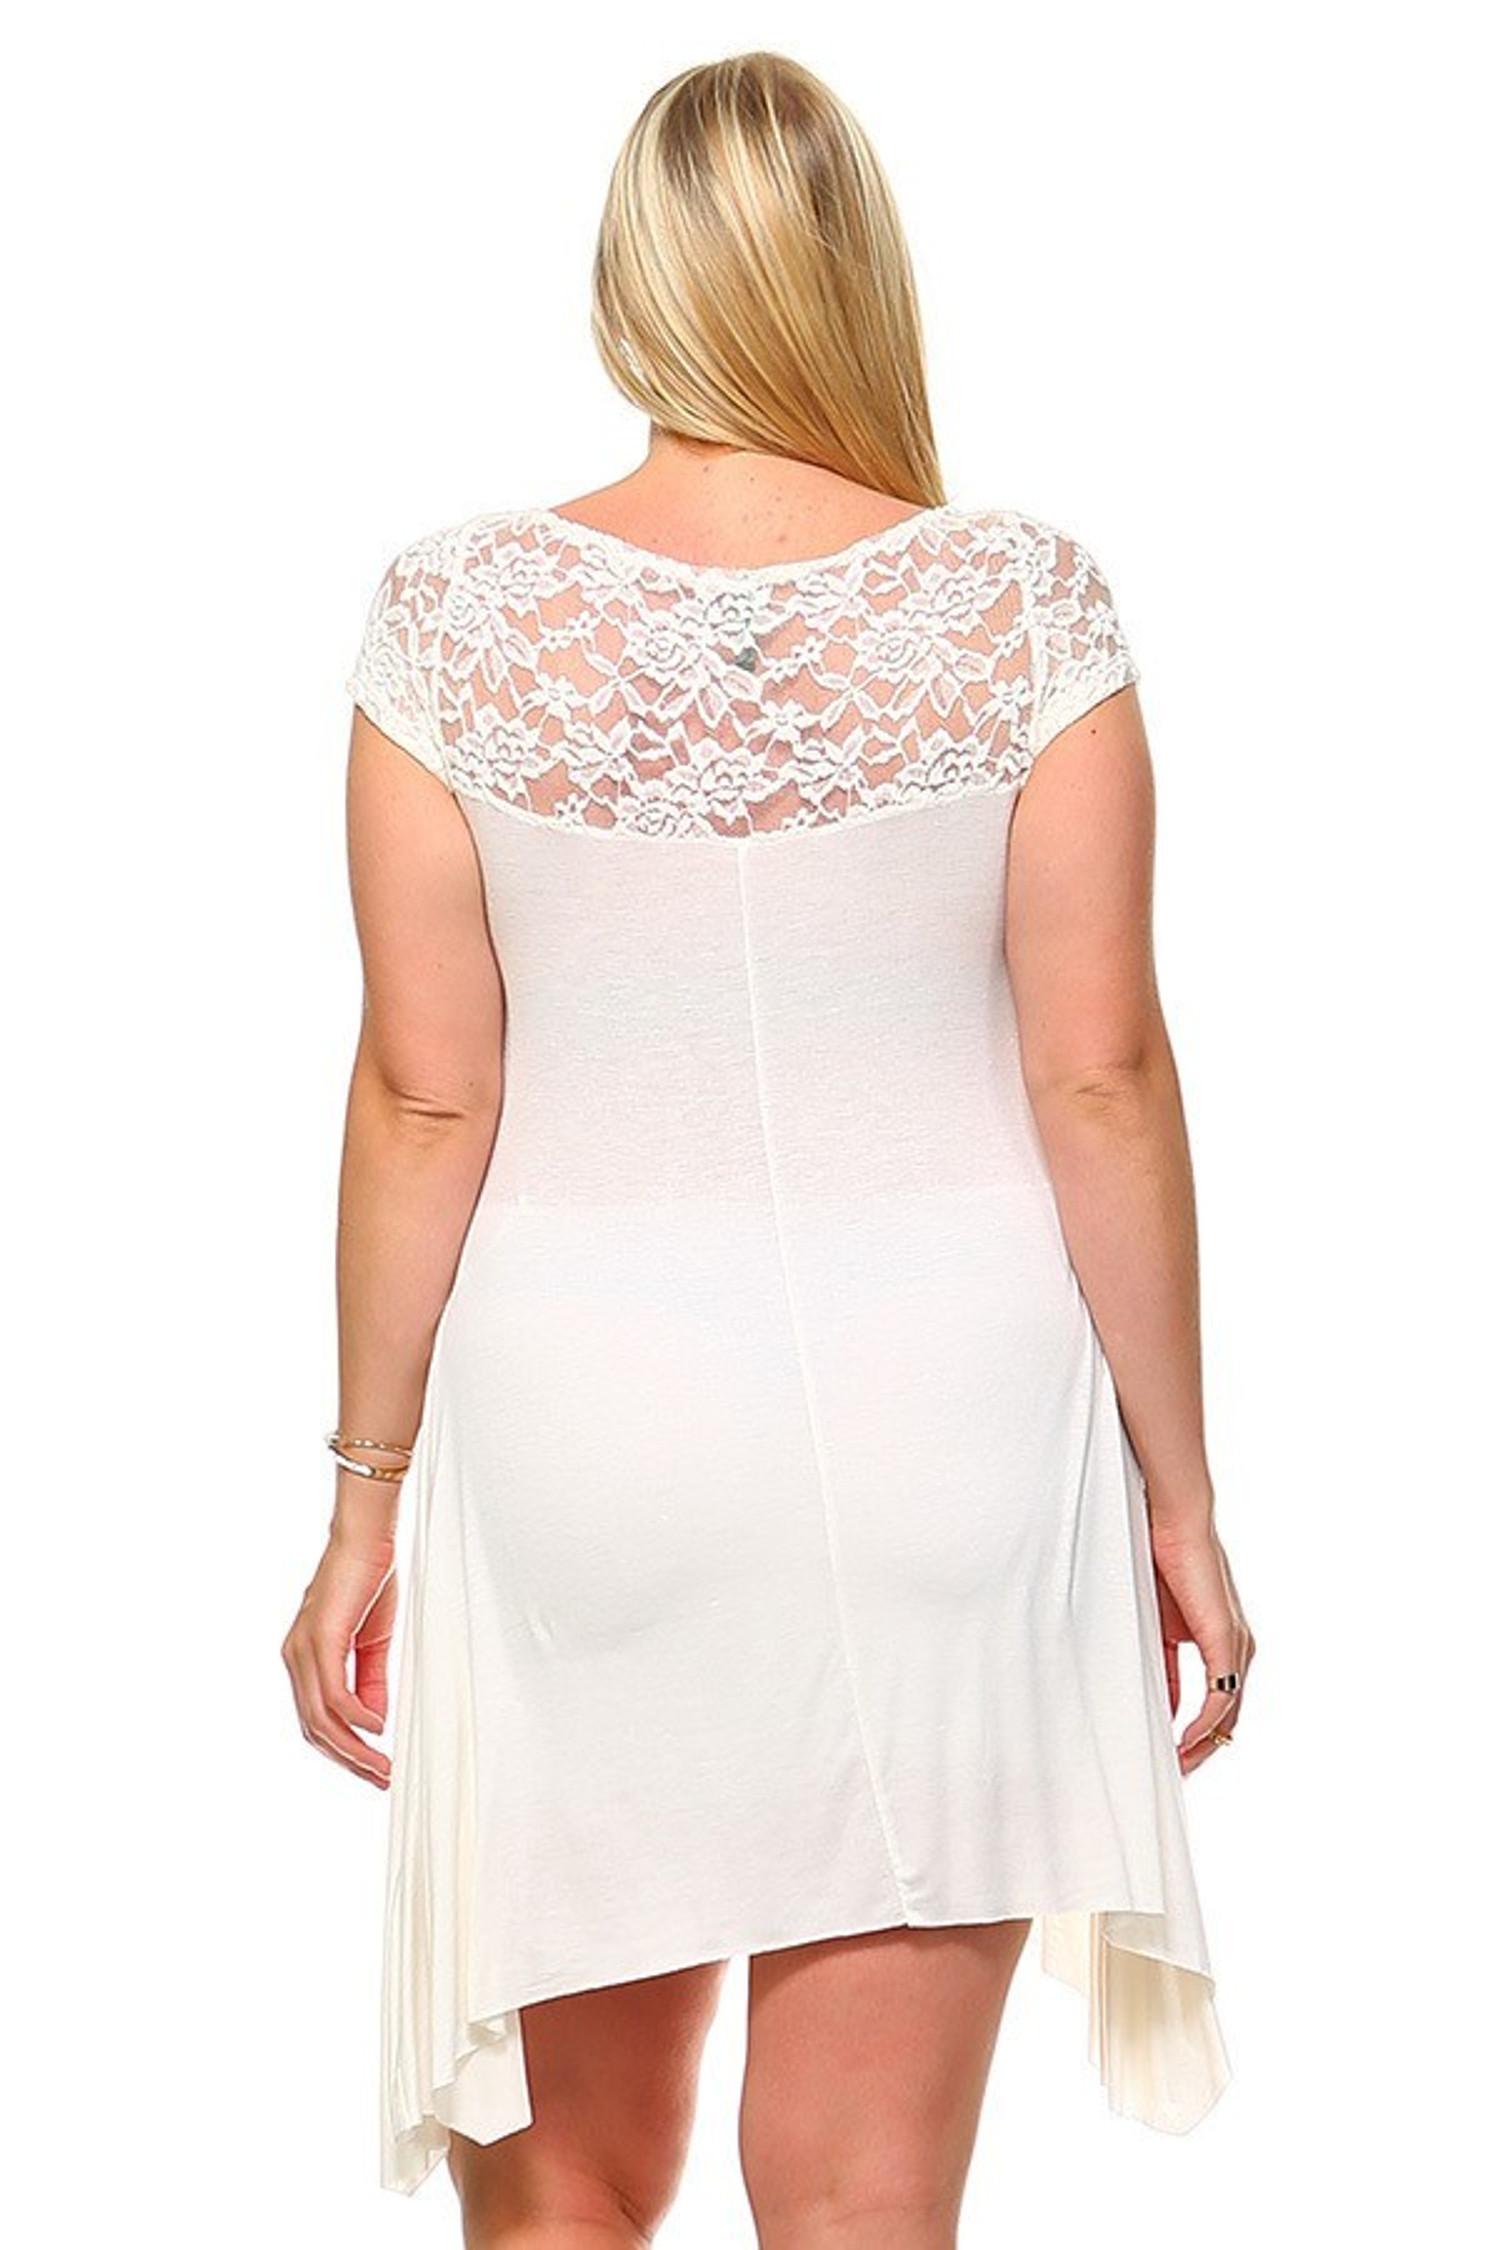 Duo Fabric Short Sleeve Lace Detail Asymmetrical Plus Size Dress